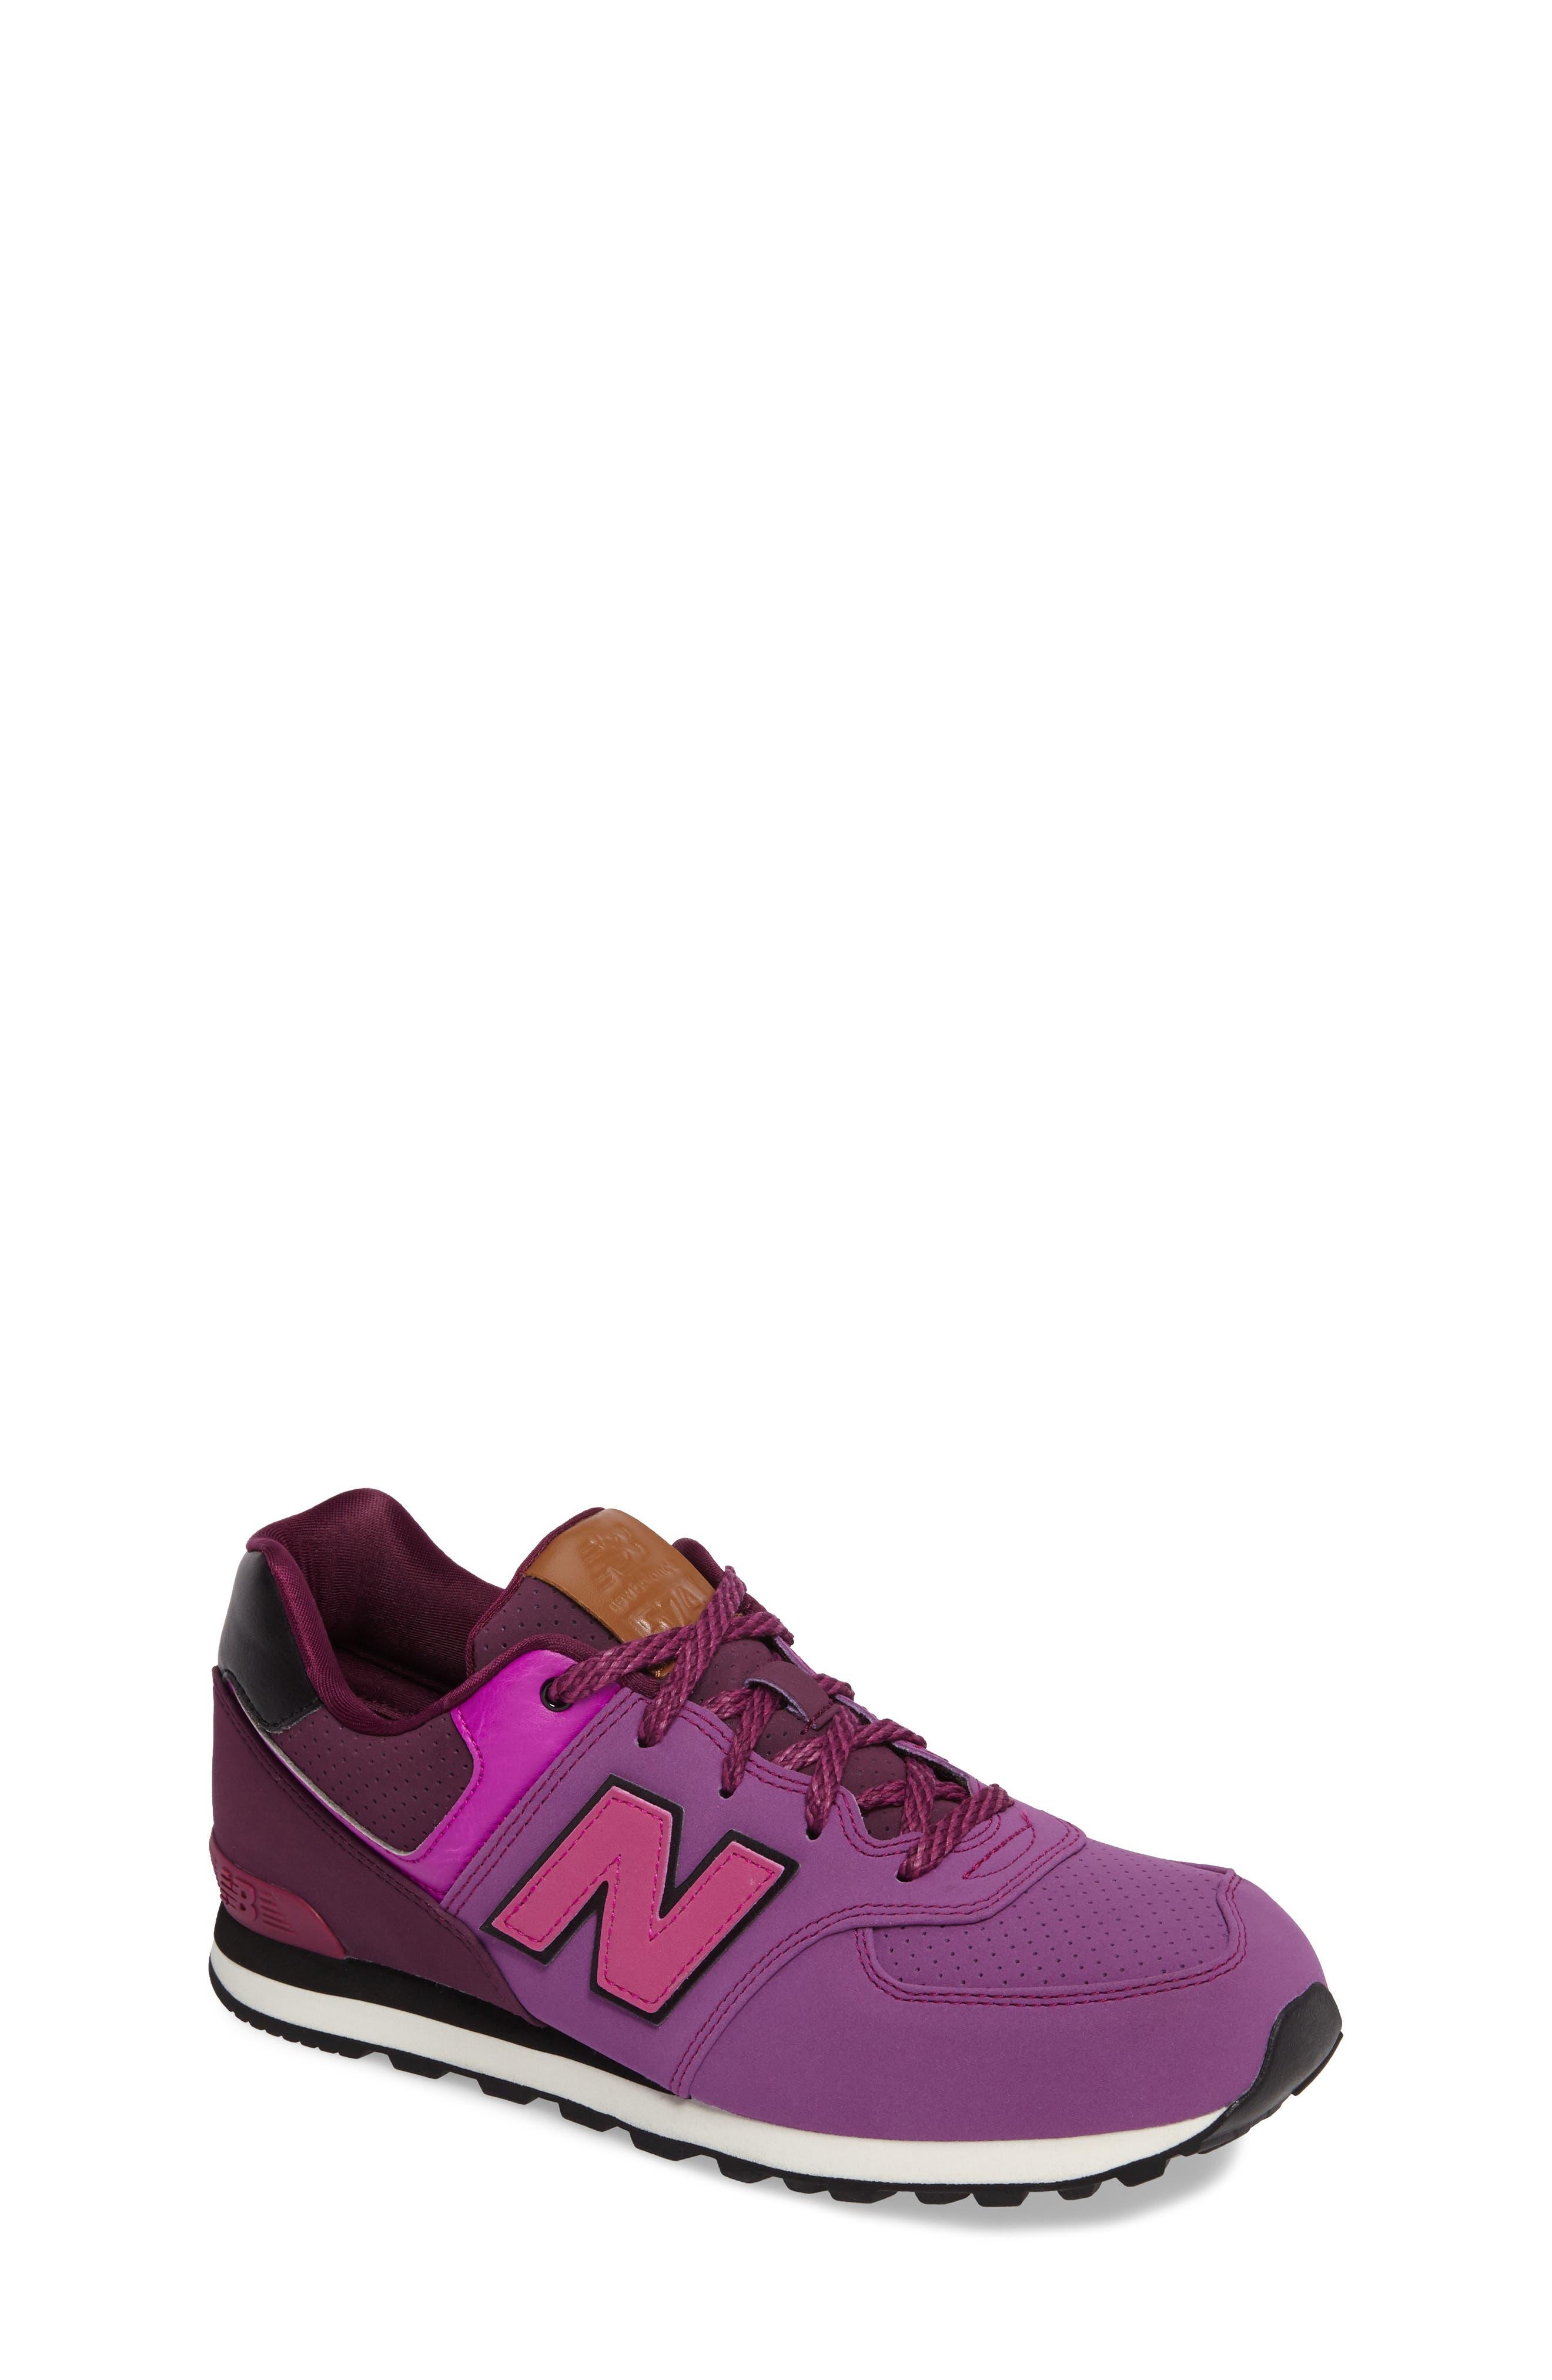 New Balance 574 v1 Sneaker (Baby, Walker, Toddler, Little Kid & Big Kid)